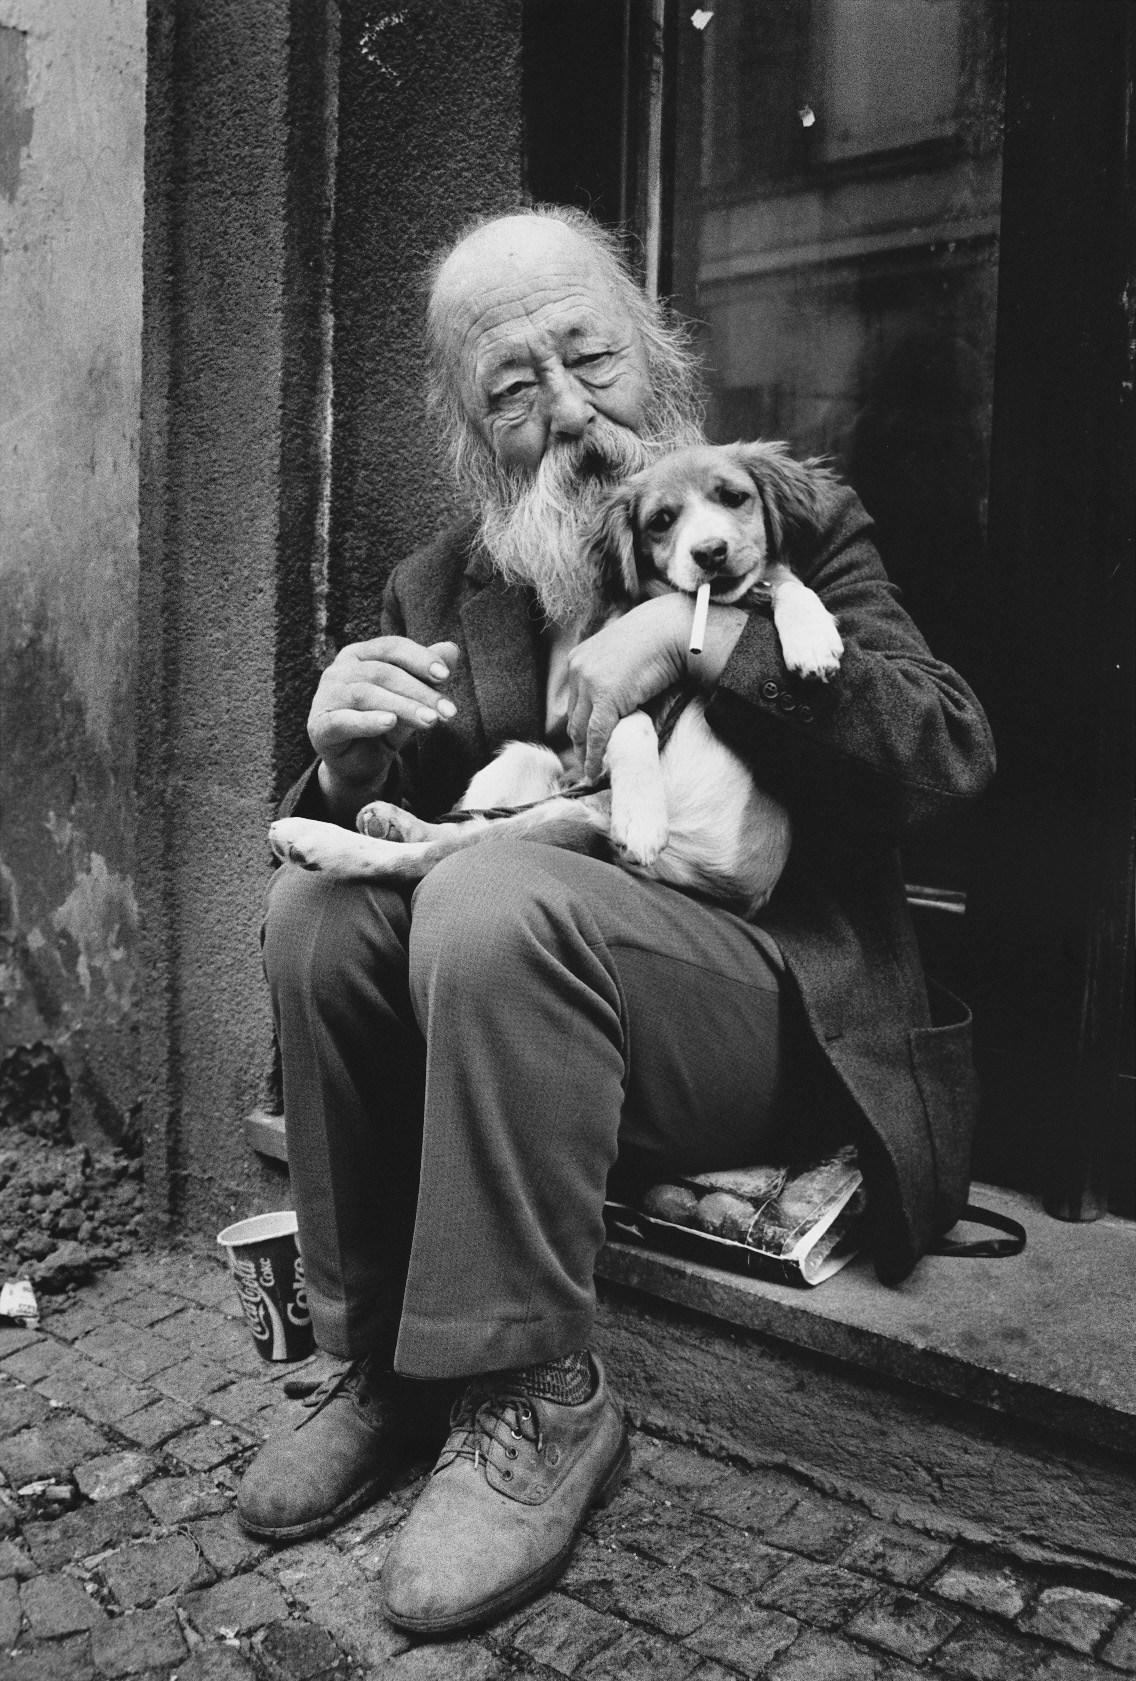 Old man with his dog, Prague.